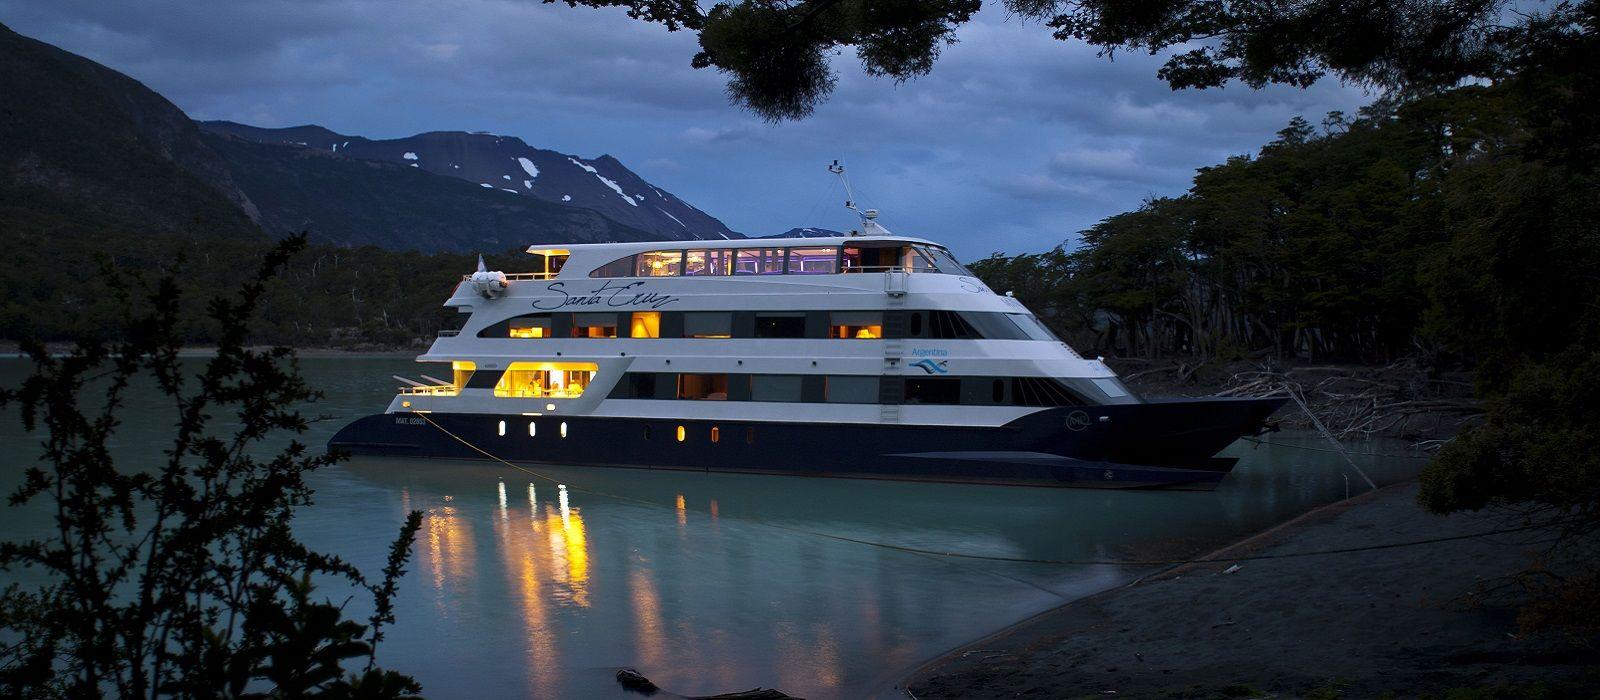 Hotel Santa Cruz Cruise by Marpatag Argentina